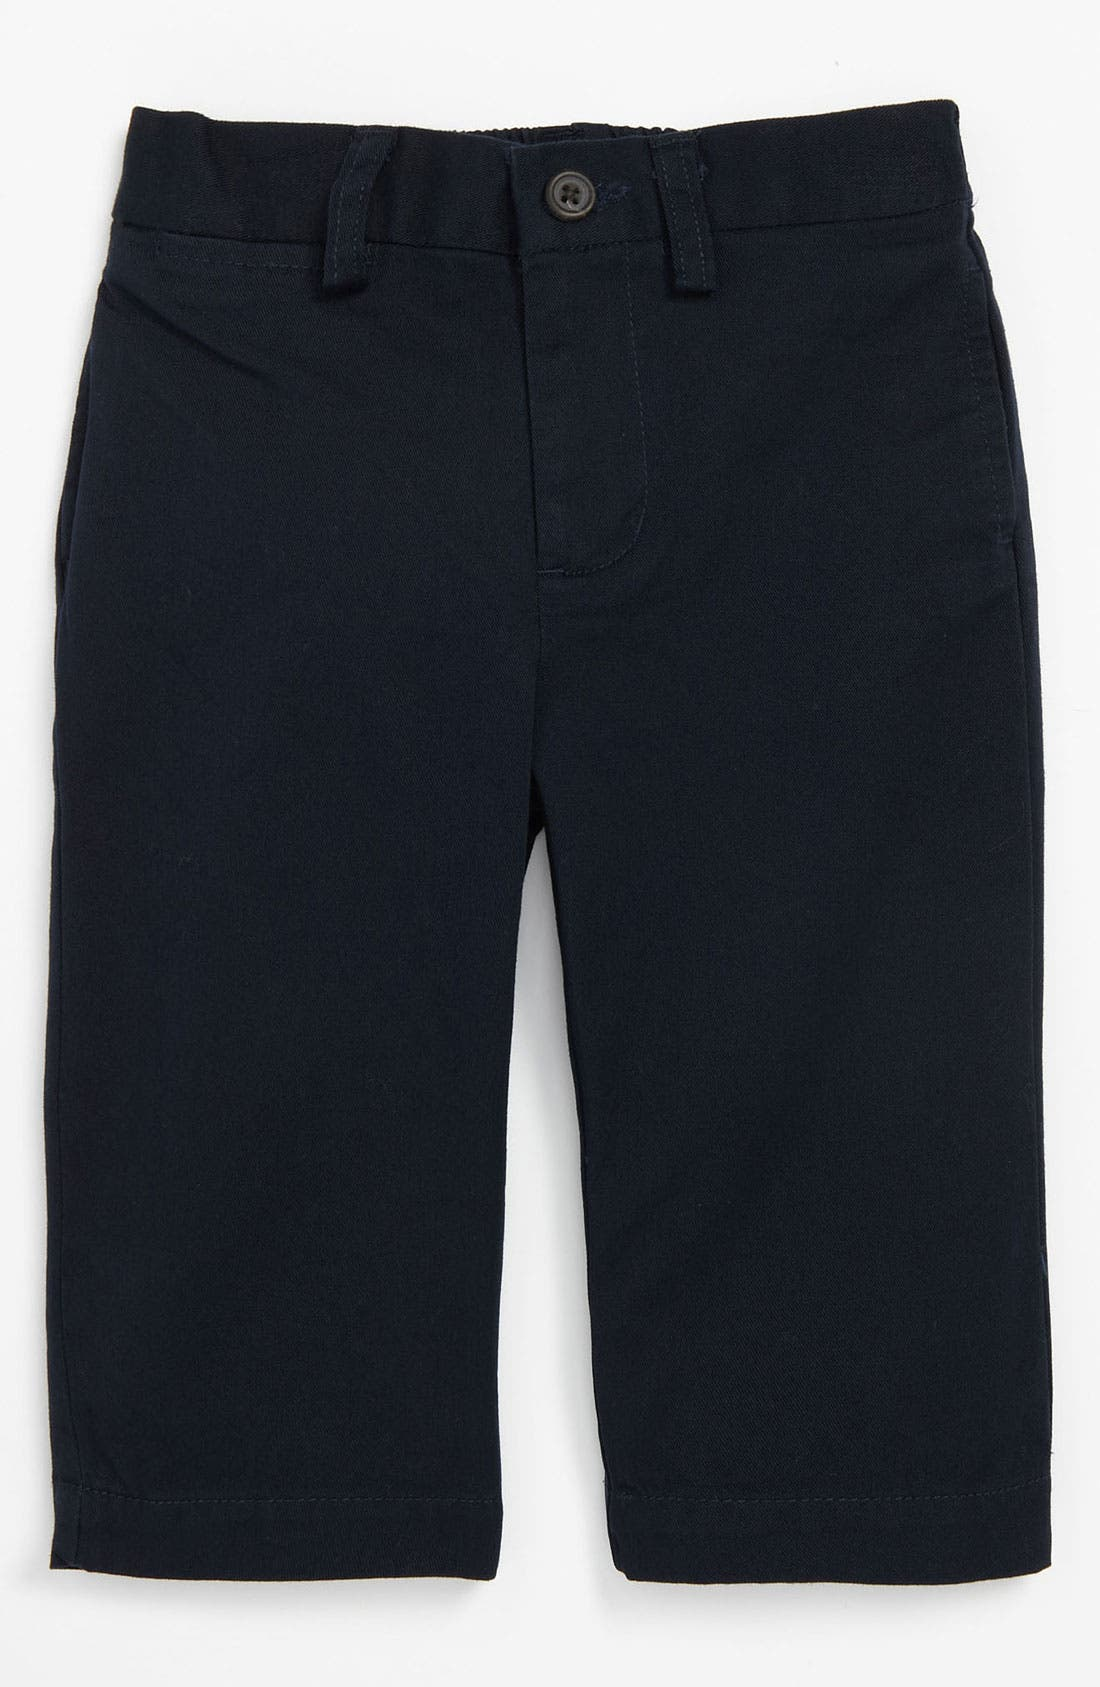 Alternate Image 1 Selected - Ralph Lauren Flat Front Pants (Baby)